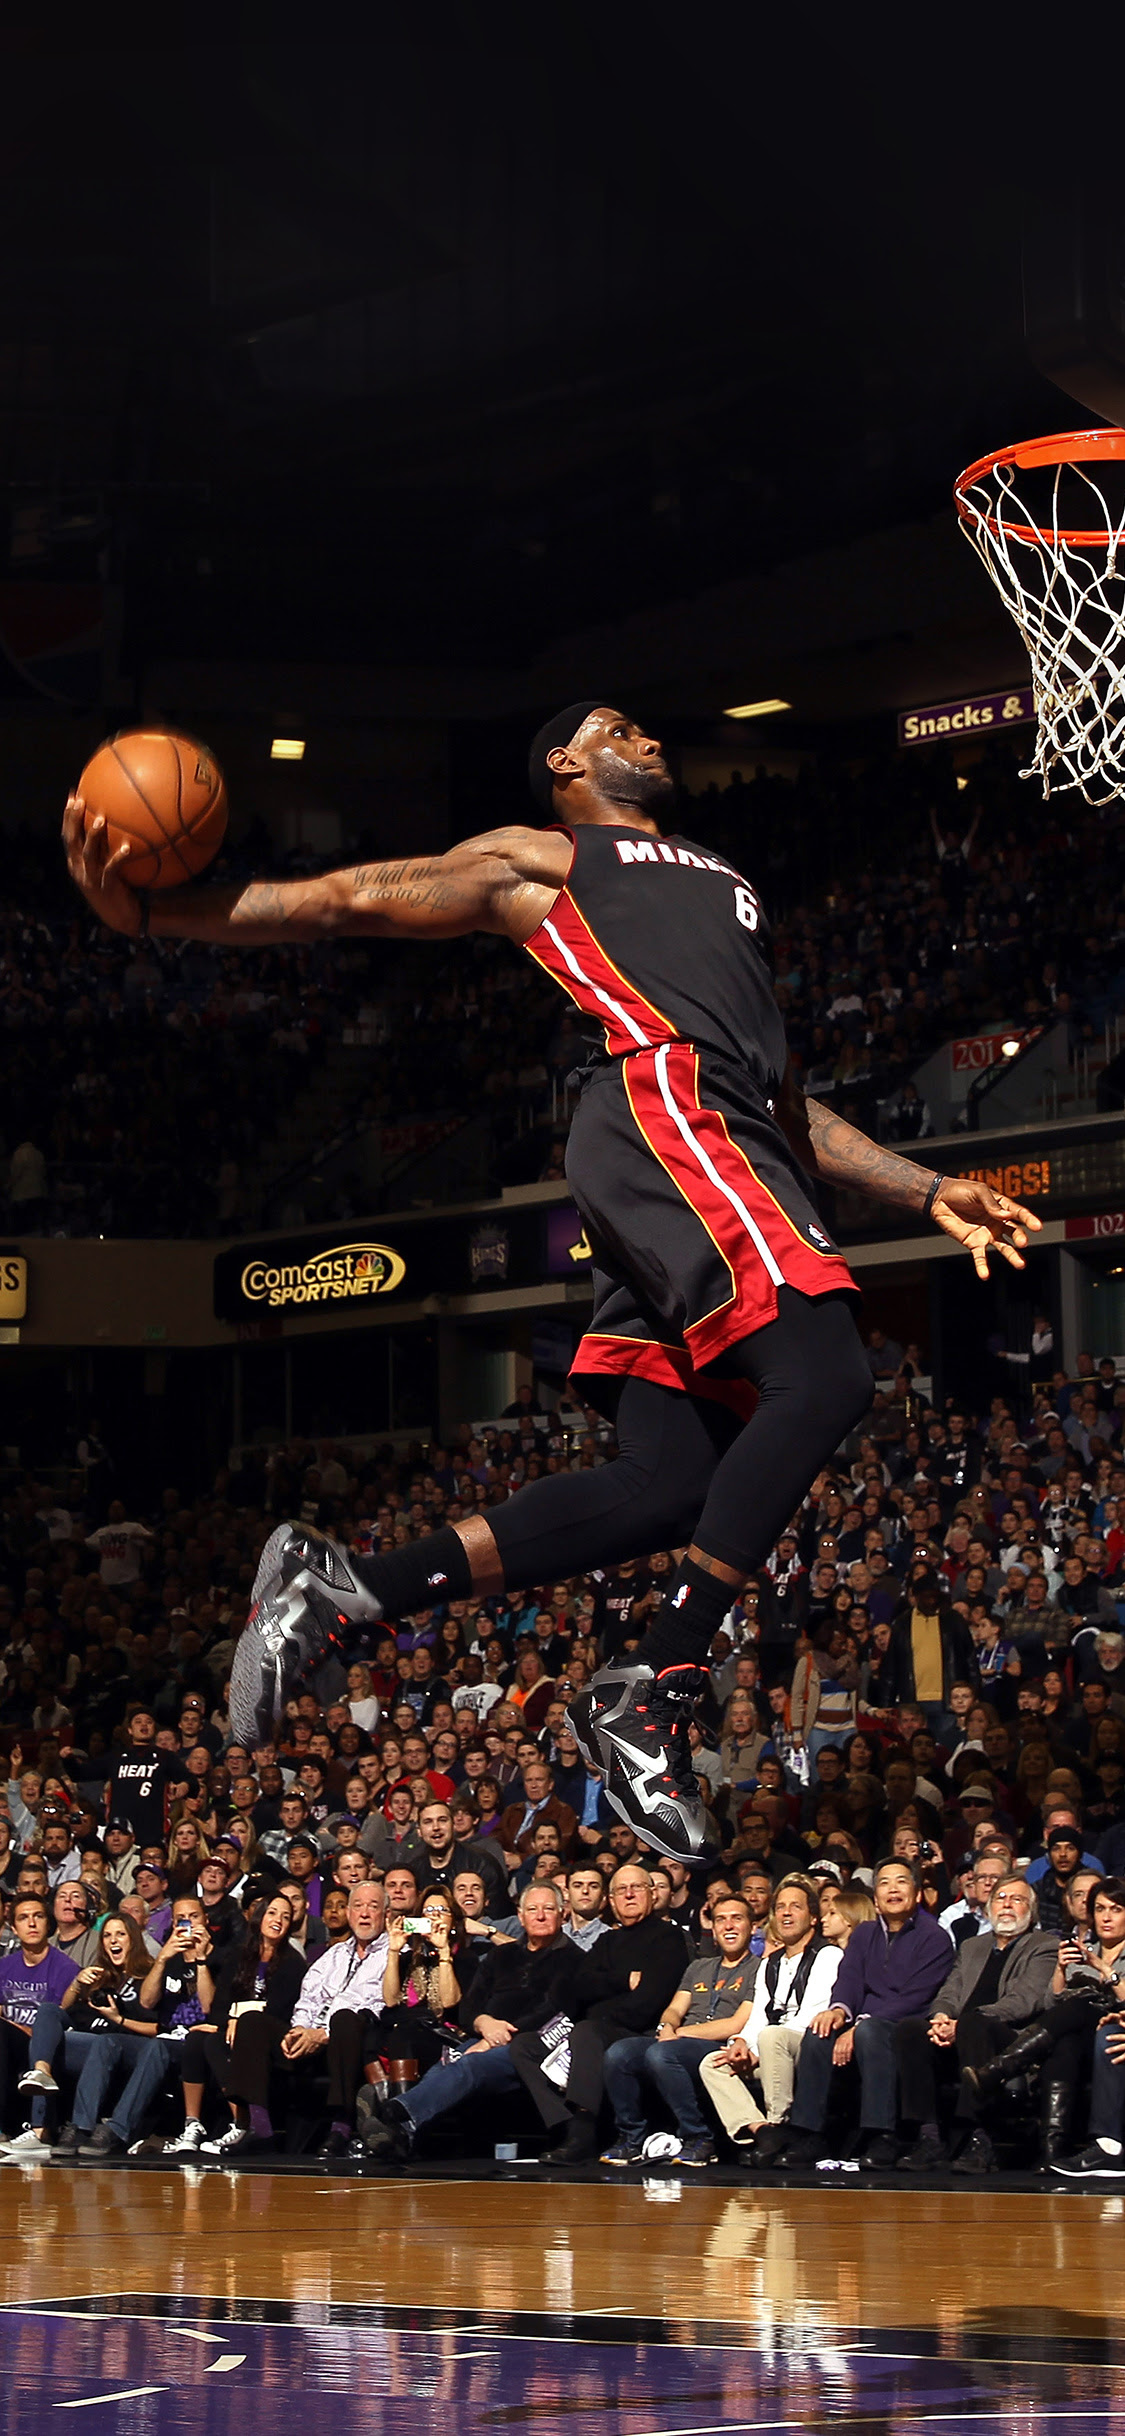 iPhoneXpapers - he99-lebron-james-dunk-nba-sports-art-basketball